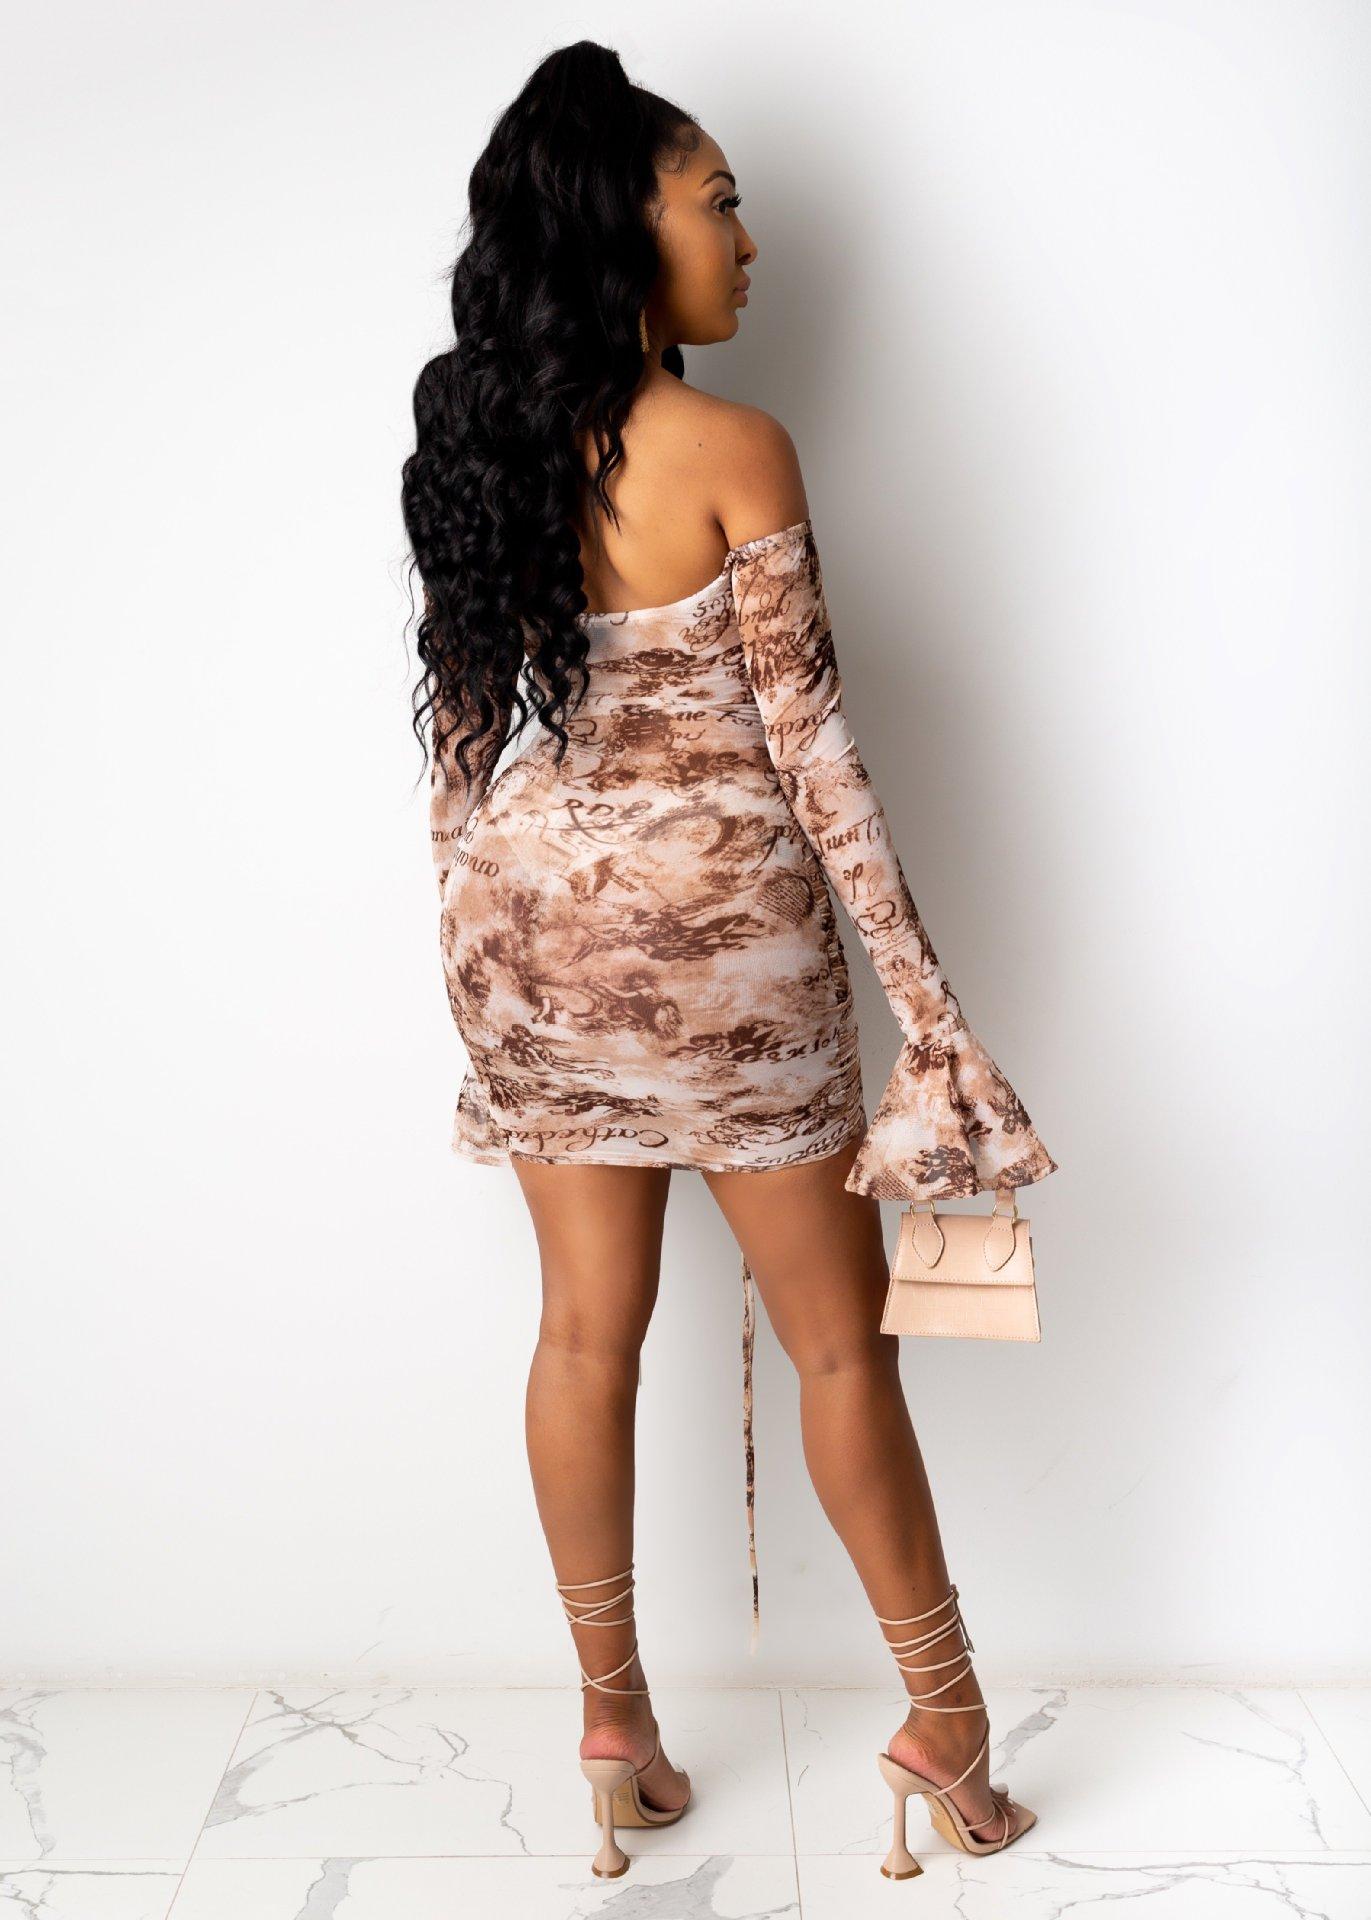 Hdb072b05ea264d3c9d3fbd0008c12021r - Adogirl Snake Print Long Sleeve Dress Women Evening Party Night Dresses Sexy Off Shoulder Drawstring Bodycon Slim Mini Dress